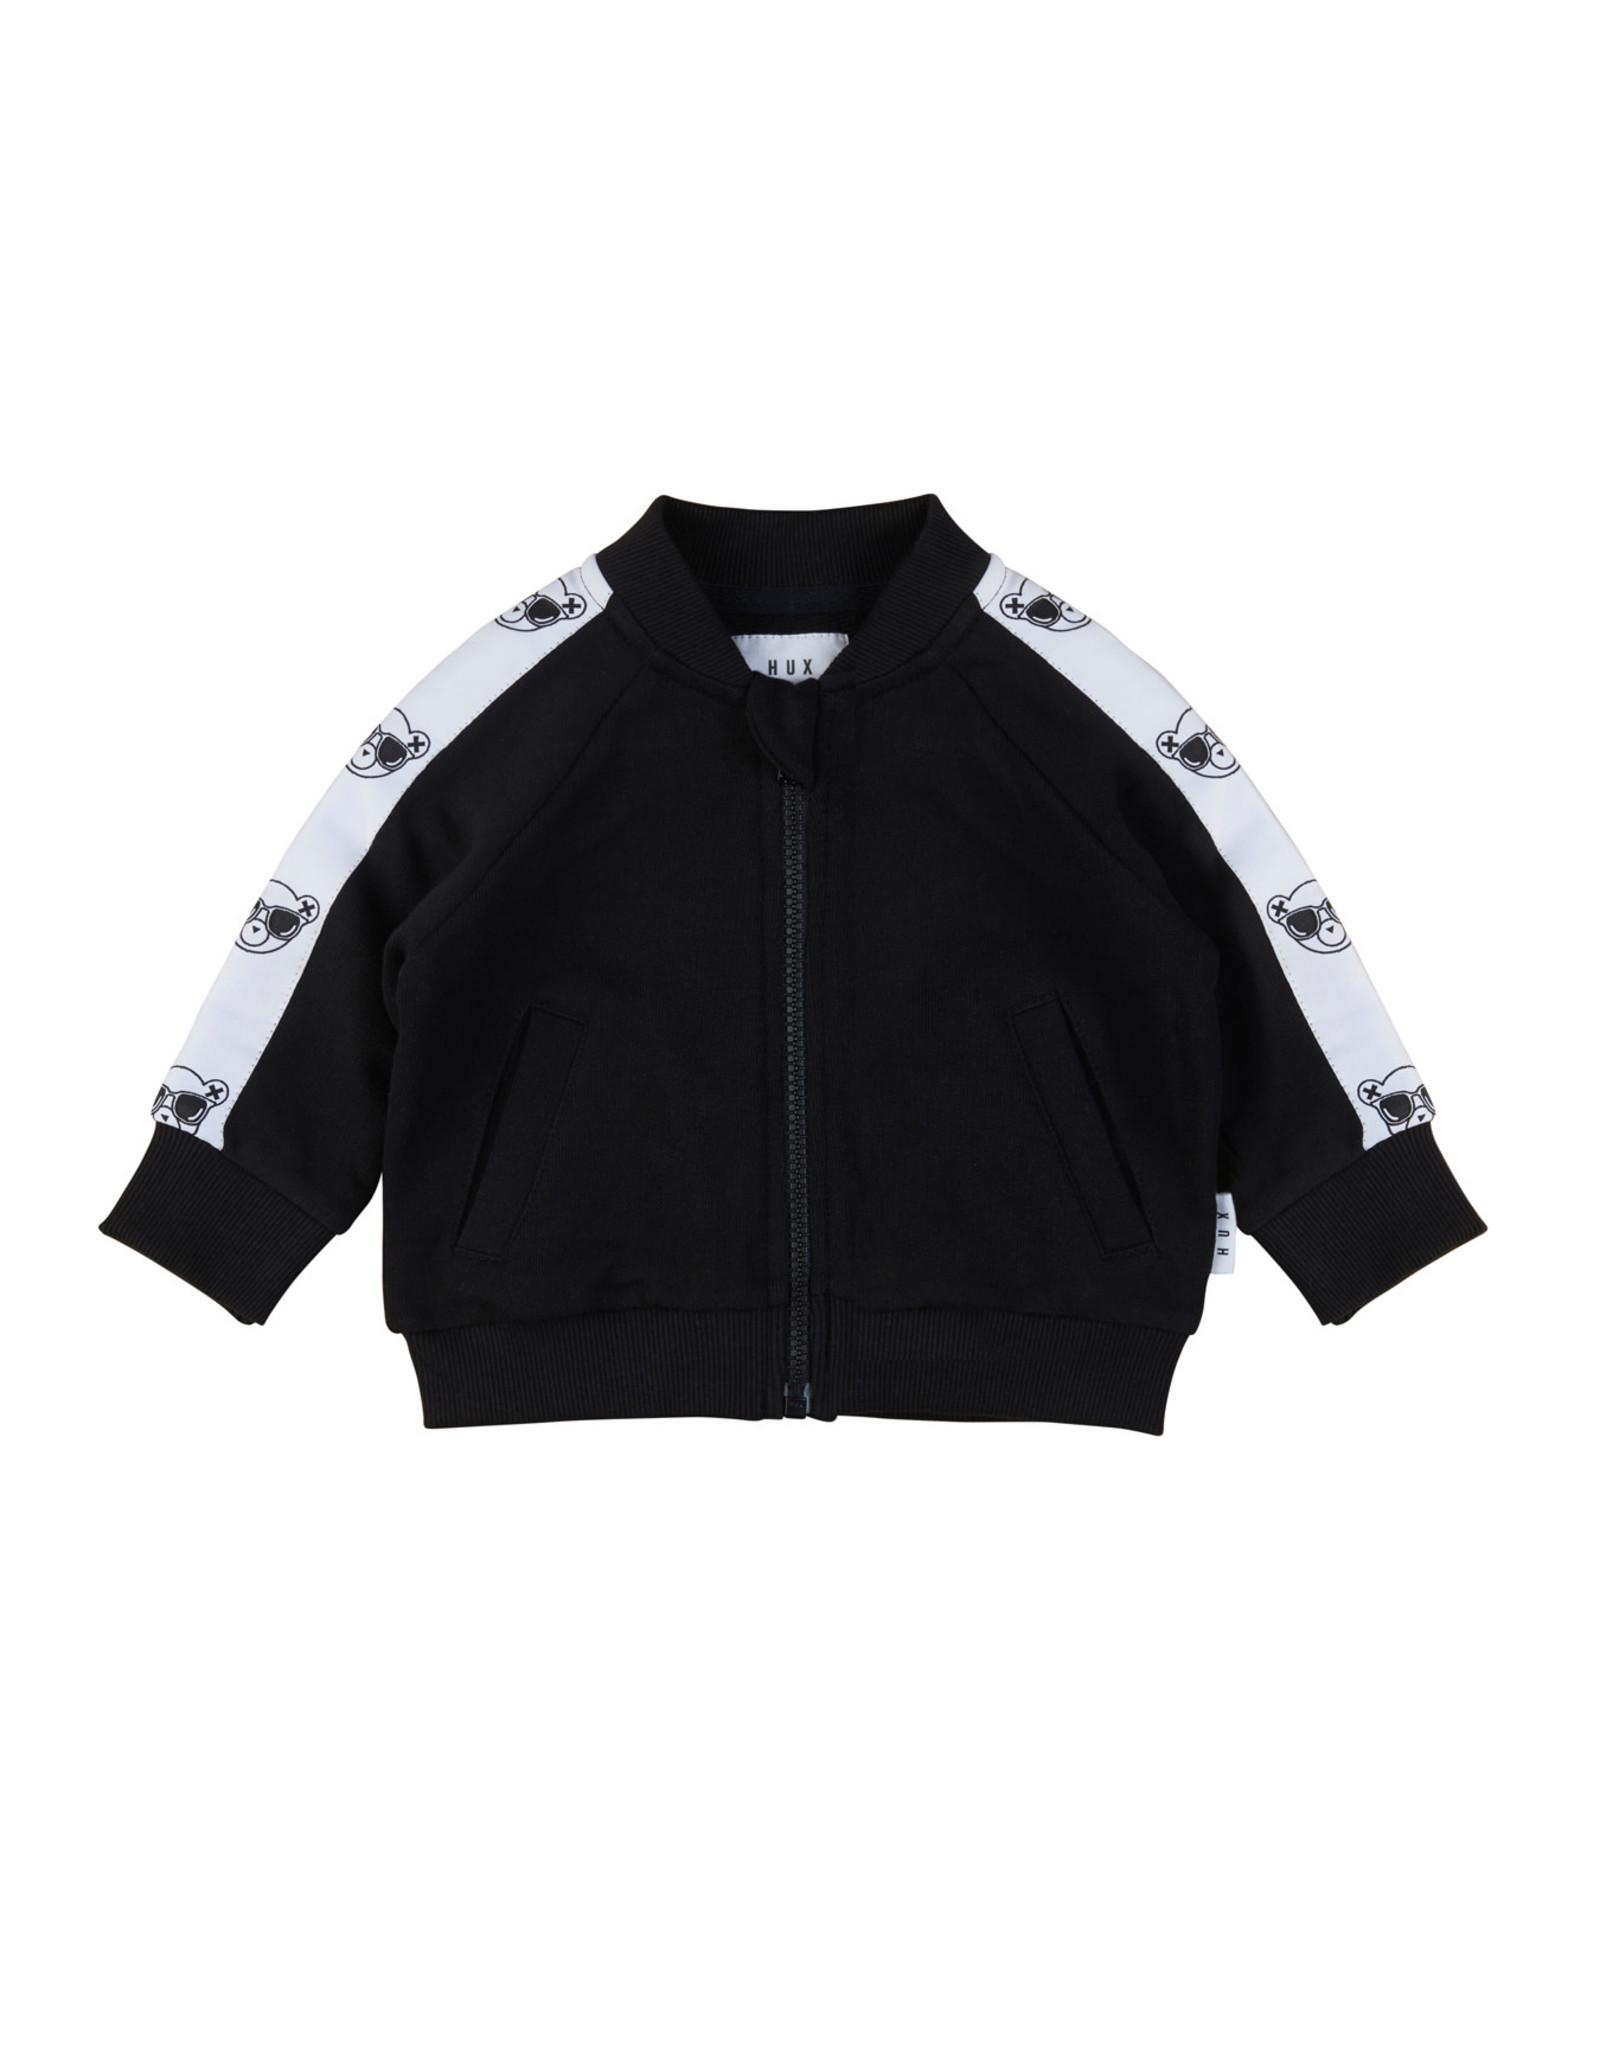 Huxbaby Hux Track Jacket Black